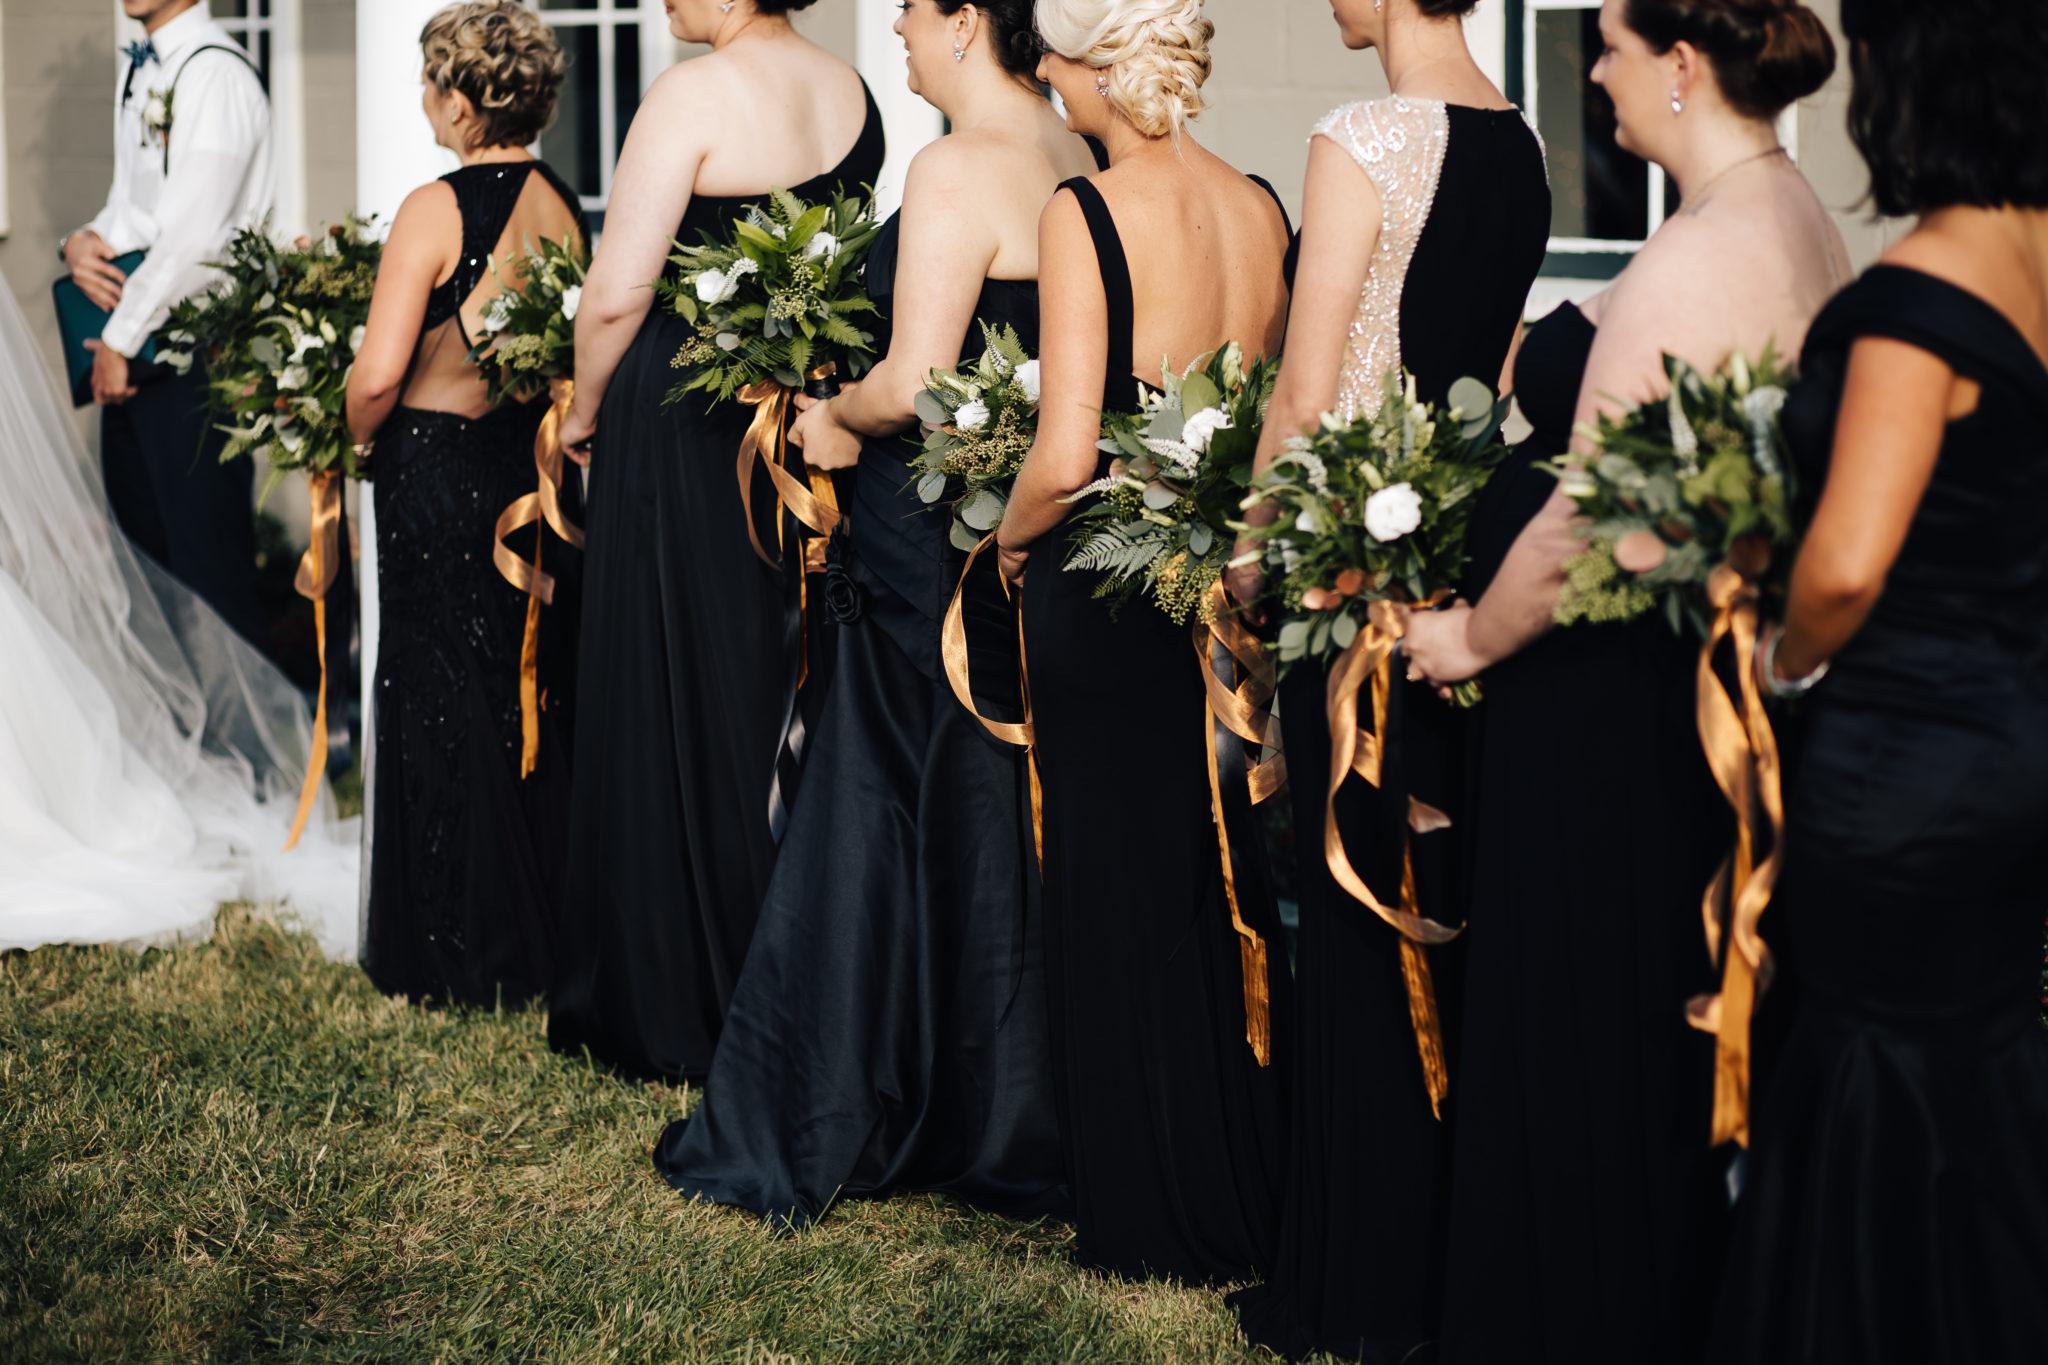 Black and white wedding bridesmaids